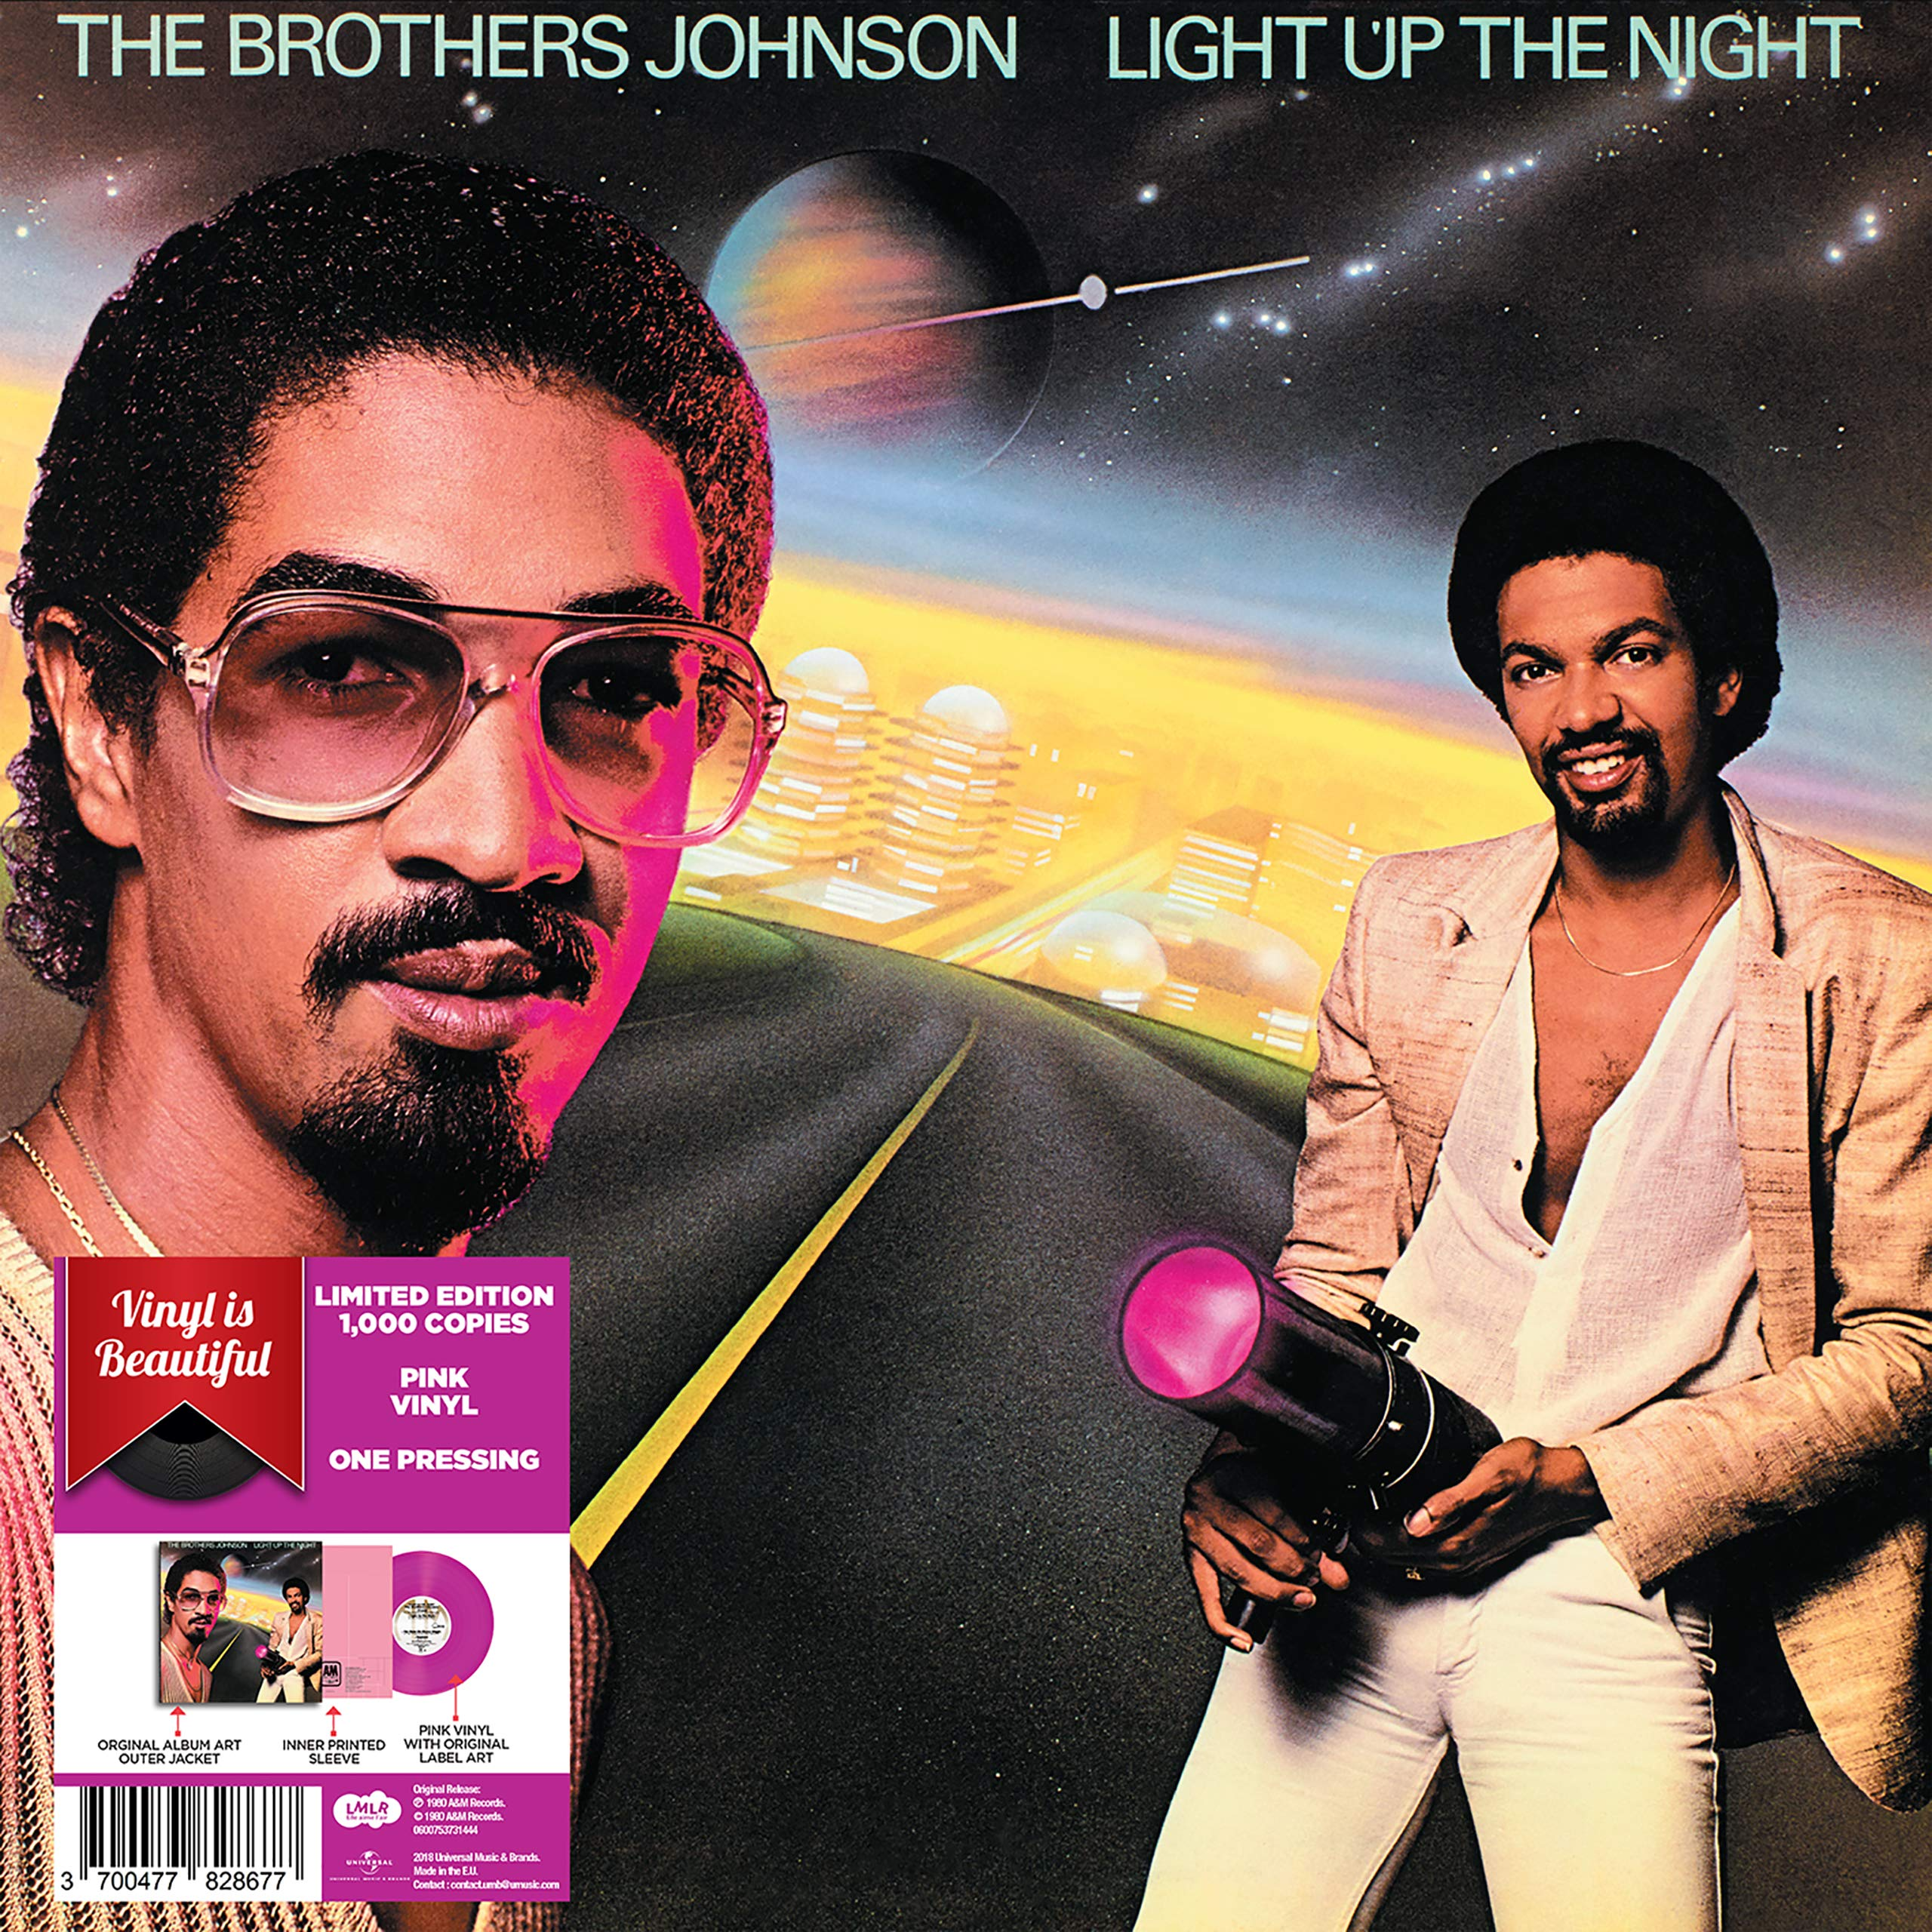 Vinilo : The Brothers Johnson - Light Up The Night (LP Vinyl)